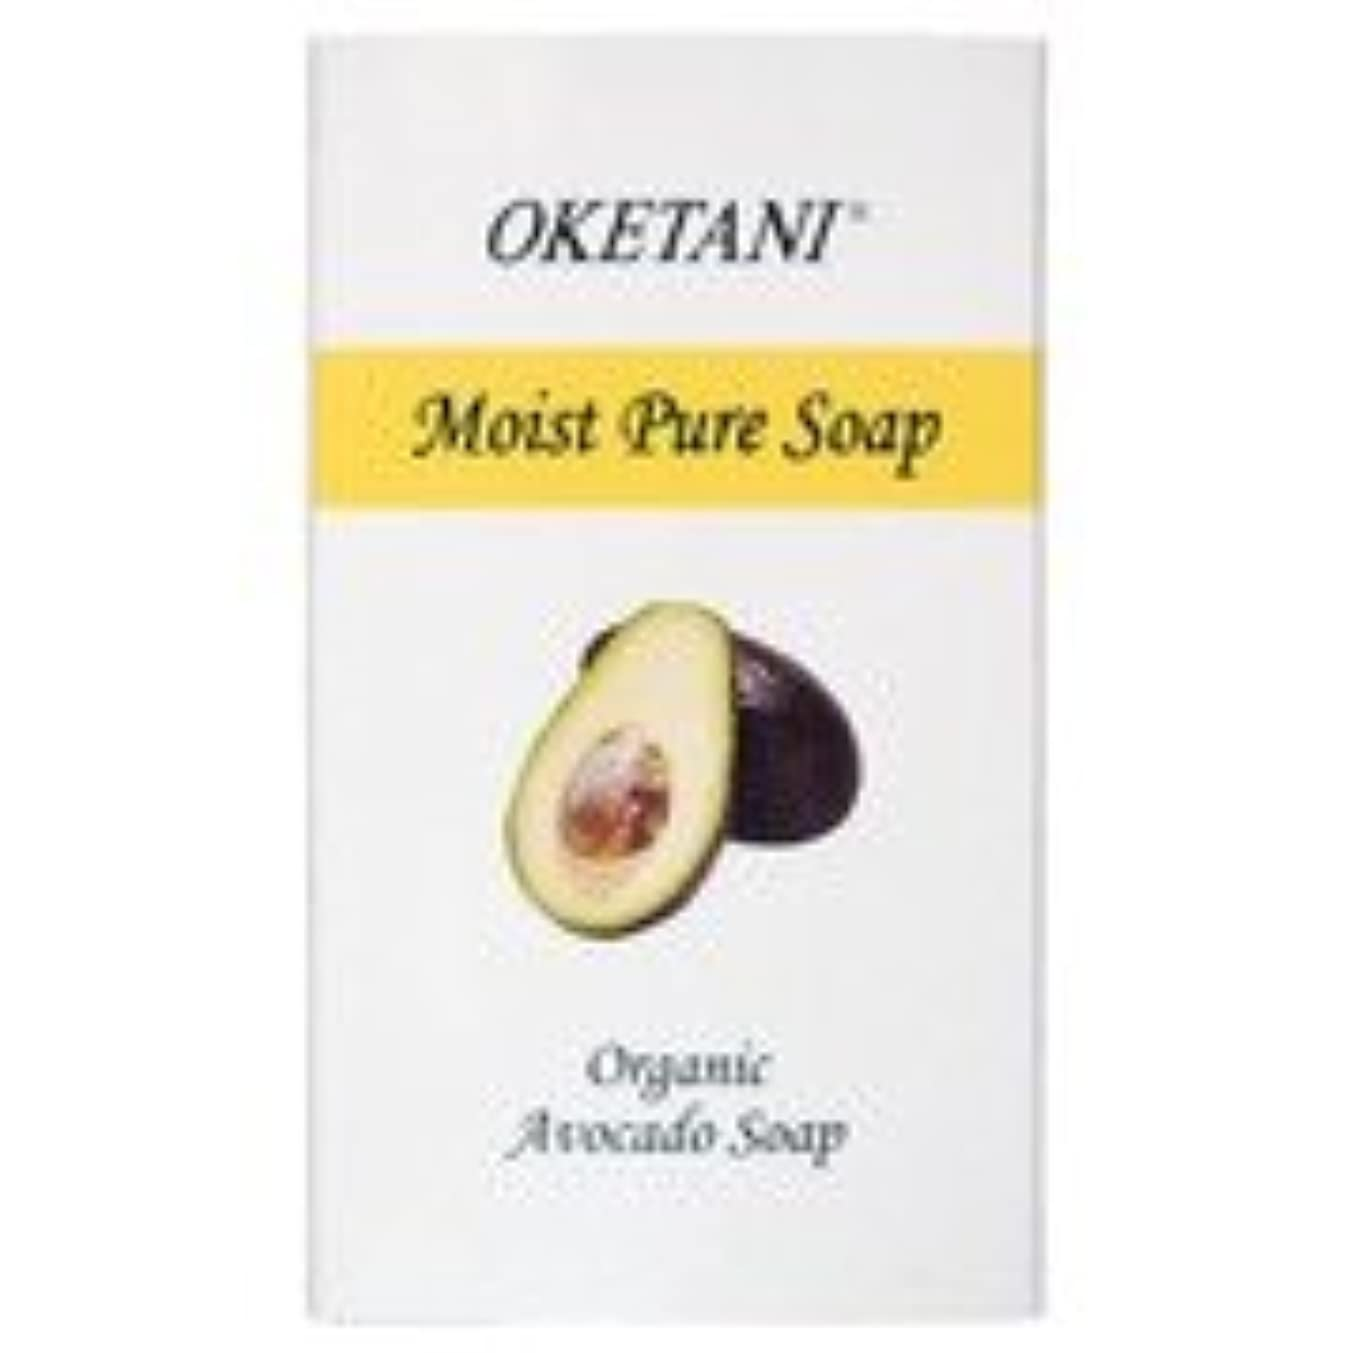 [OKETANI]モイスチャーオーガニックアボガド石鹸